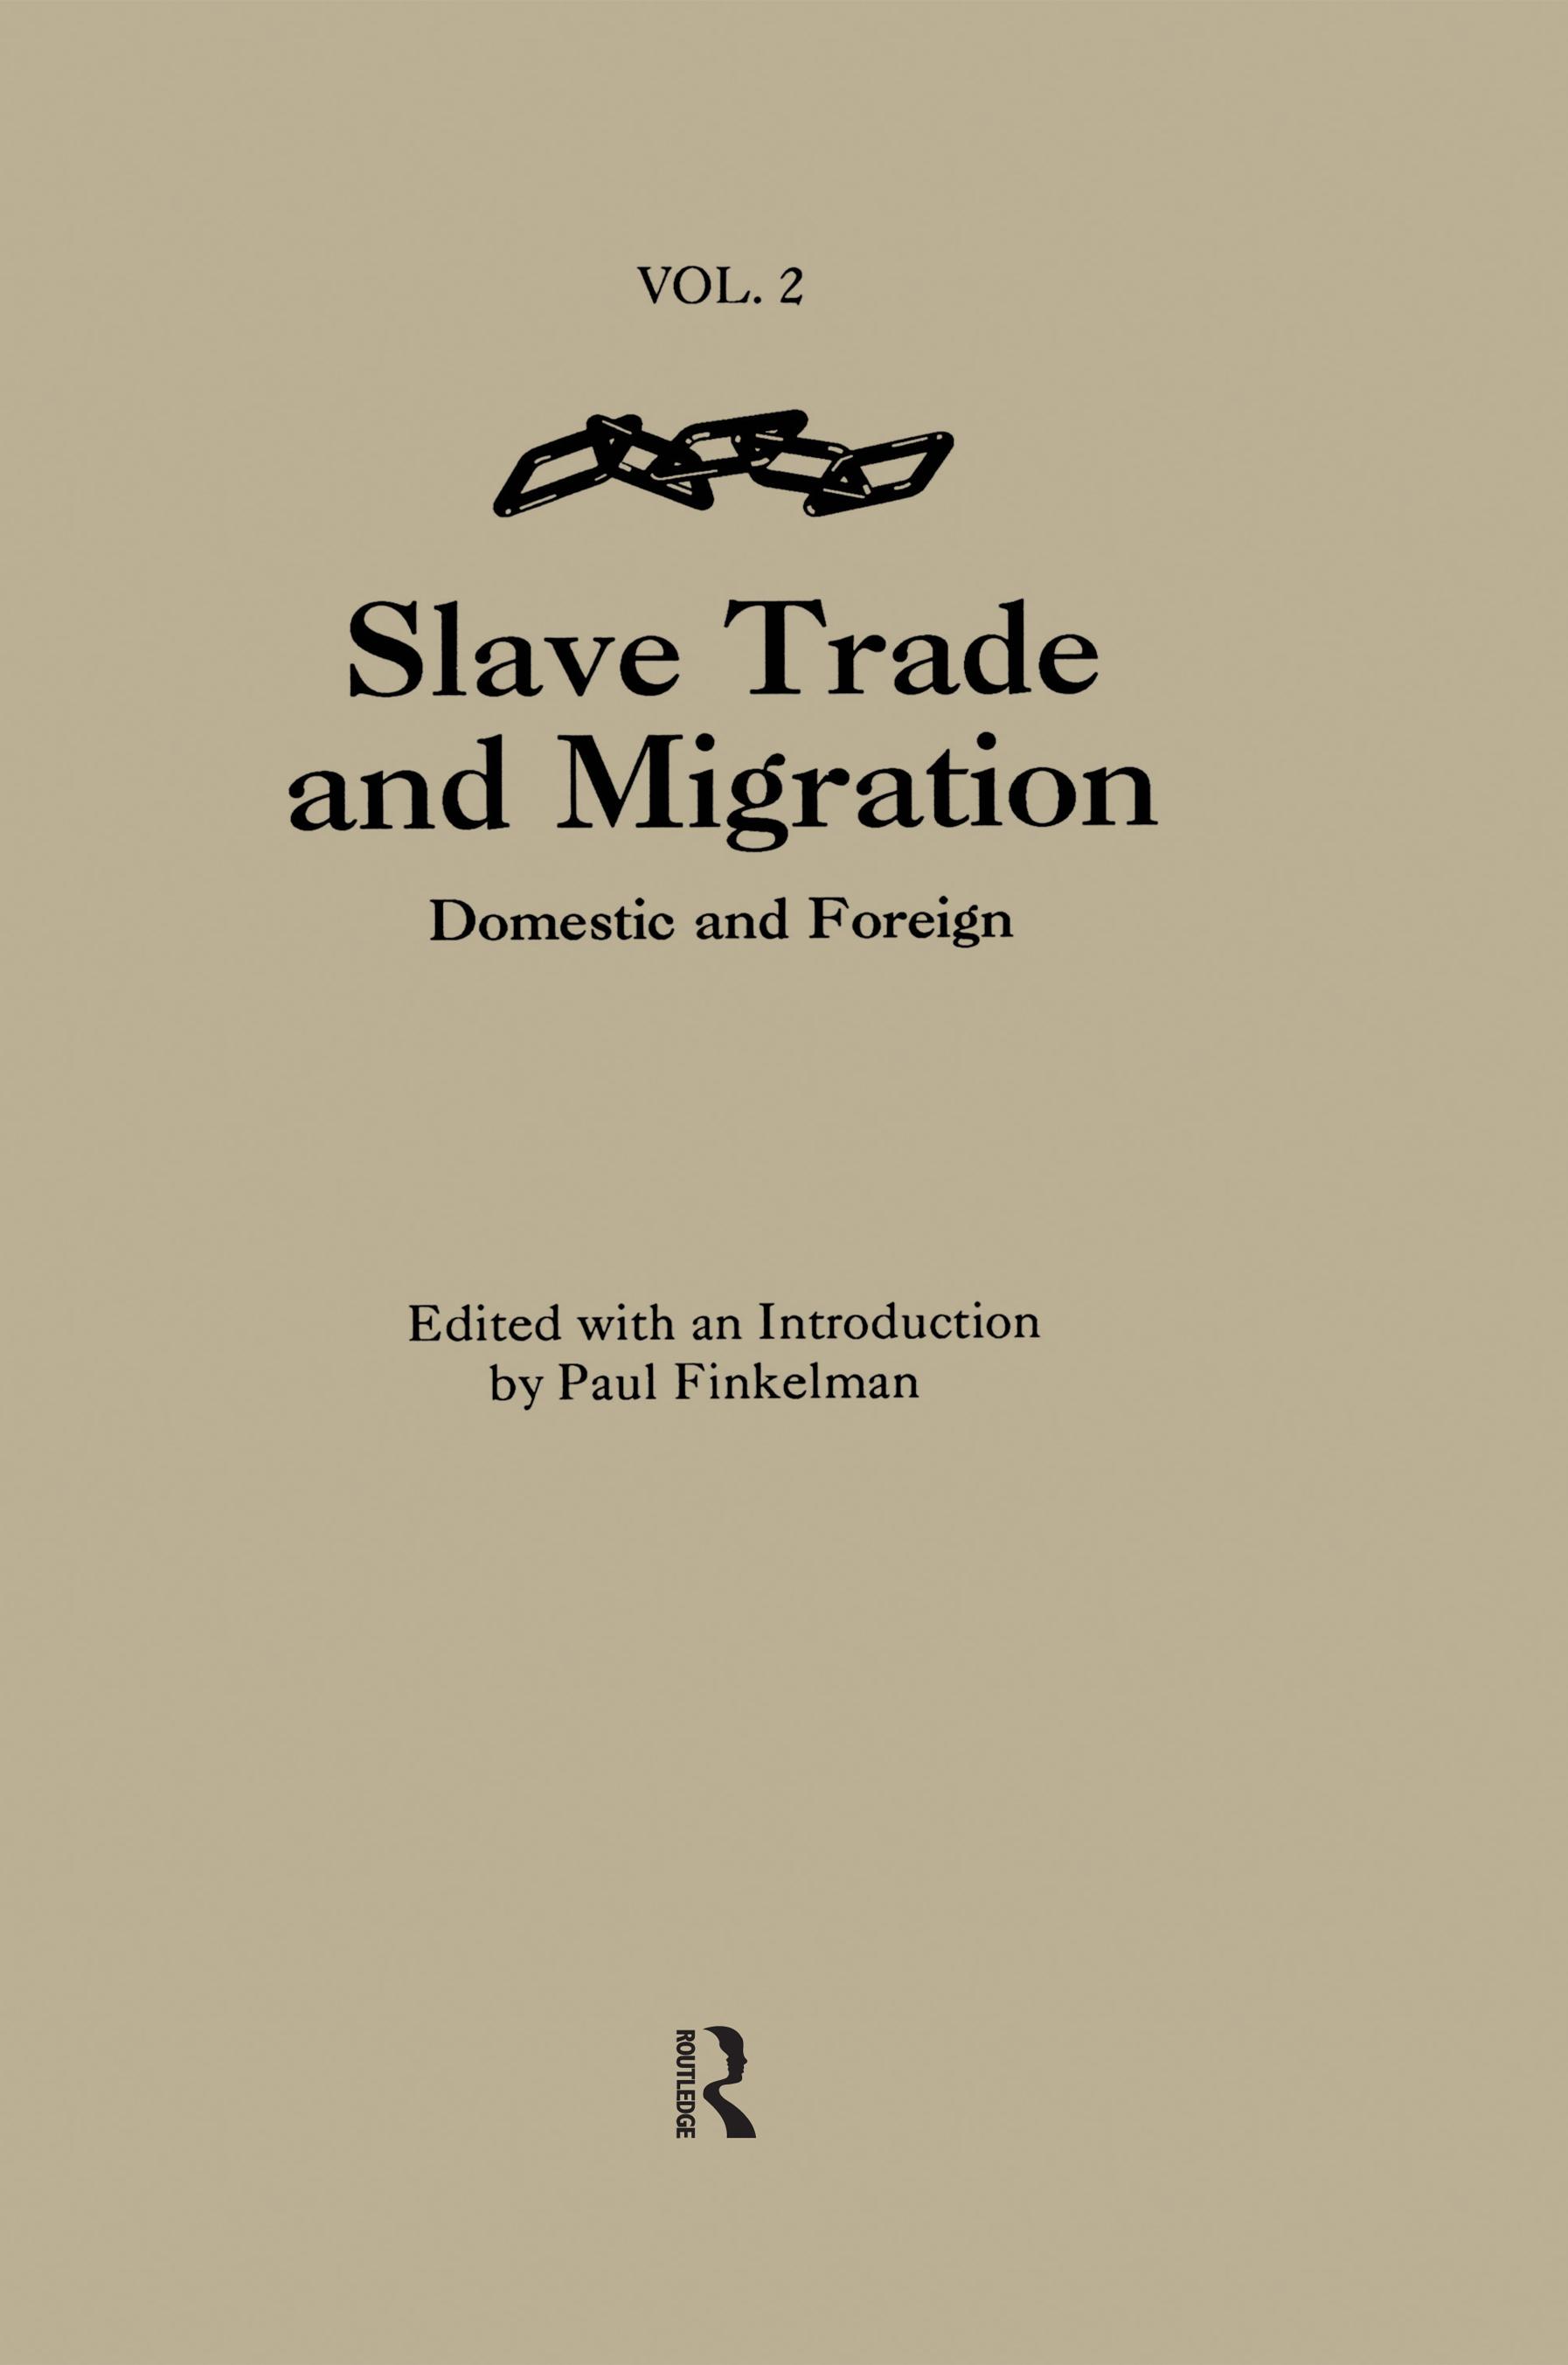 The Slave Trade & Migration